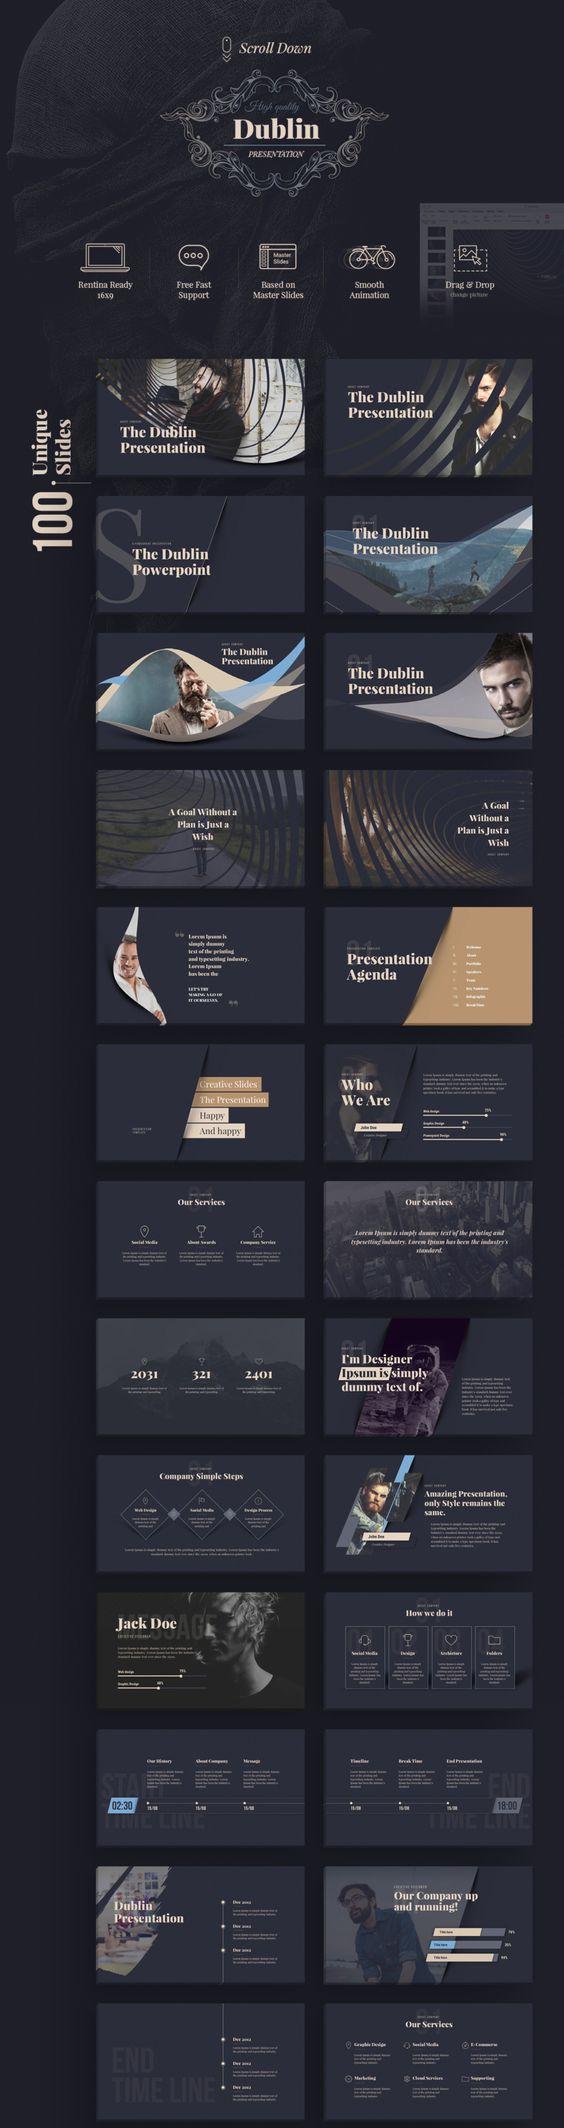 100 unique specially designed slides design identity